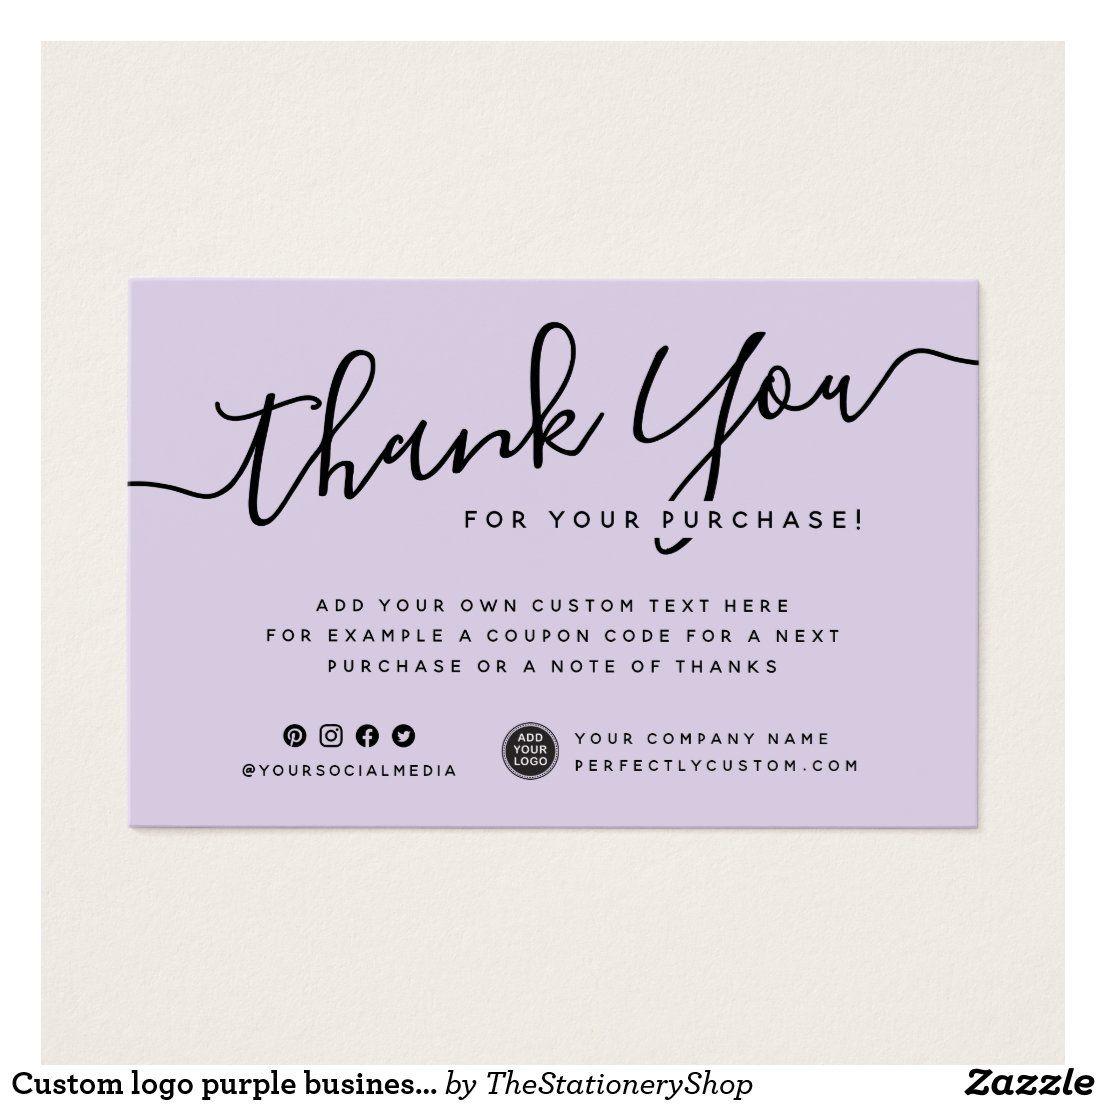 Custom Logo Purple Business Thank You Insert Card Zazzle Com In 2021 Thank You Card Design Cosmetic Business Cards Small Business Cards